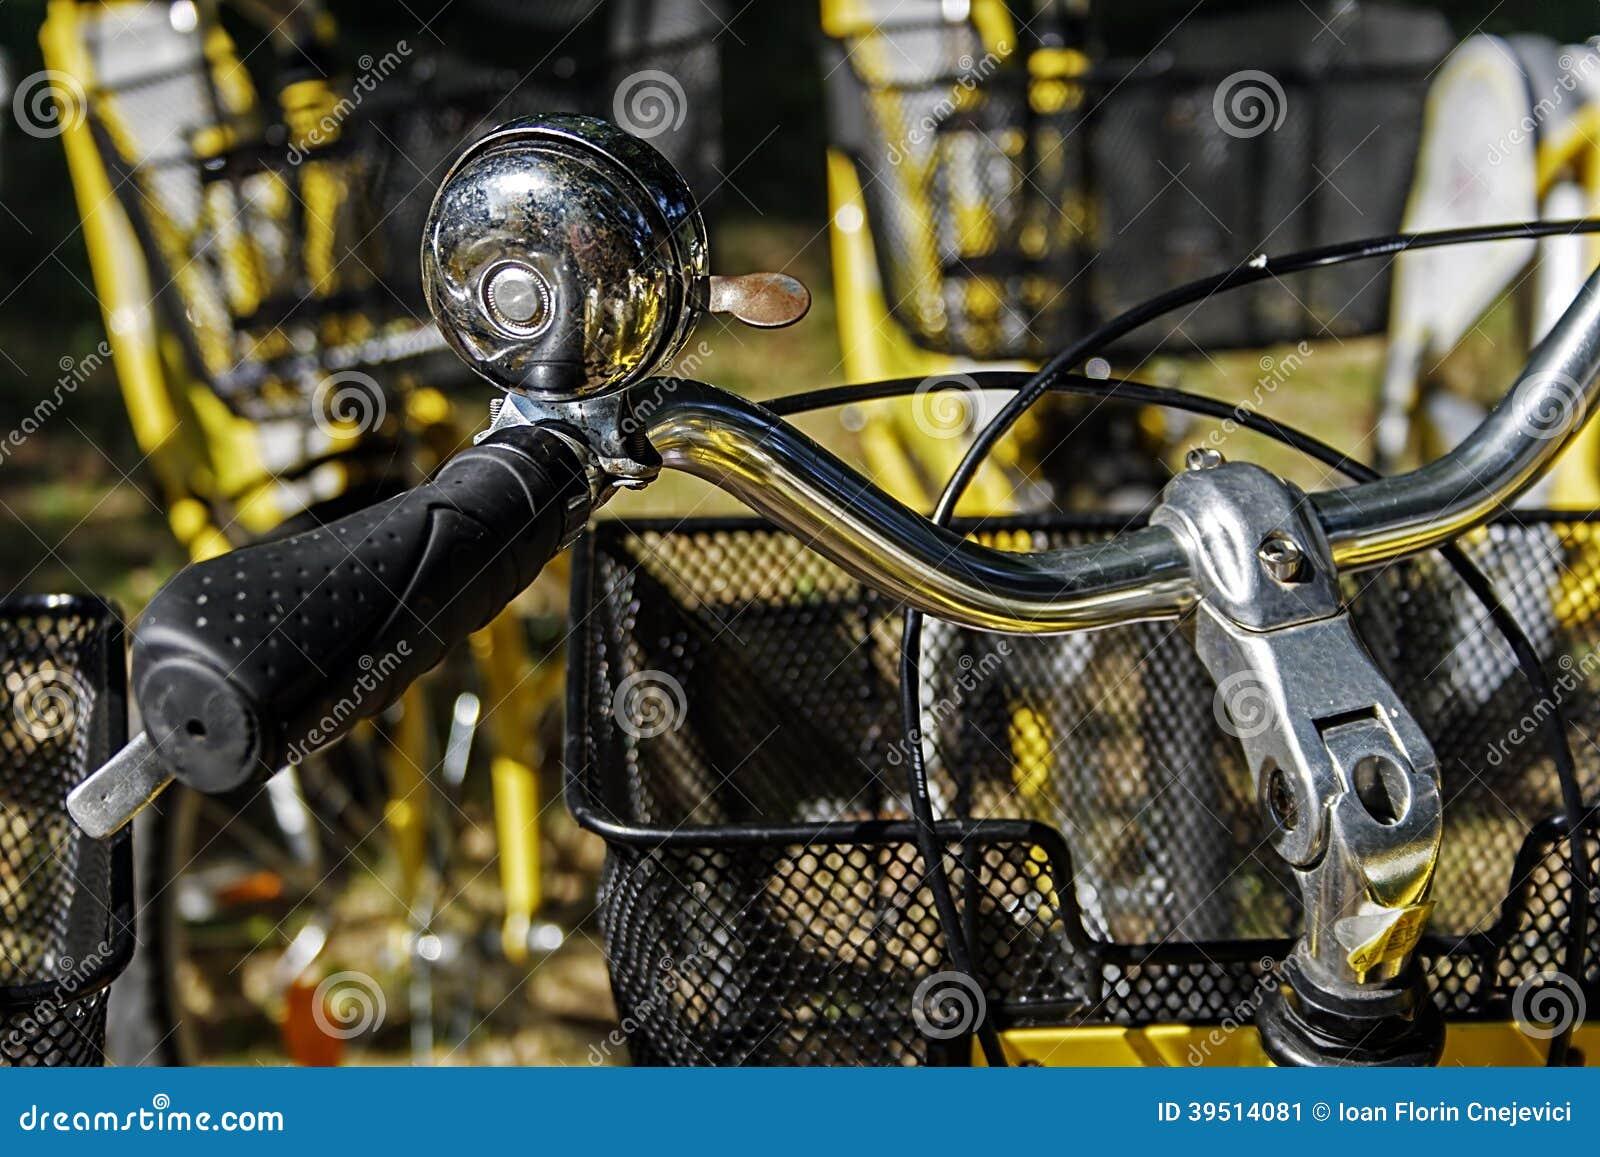 Bicycle.Detail